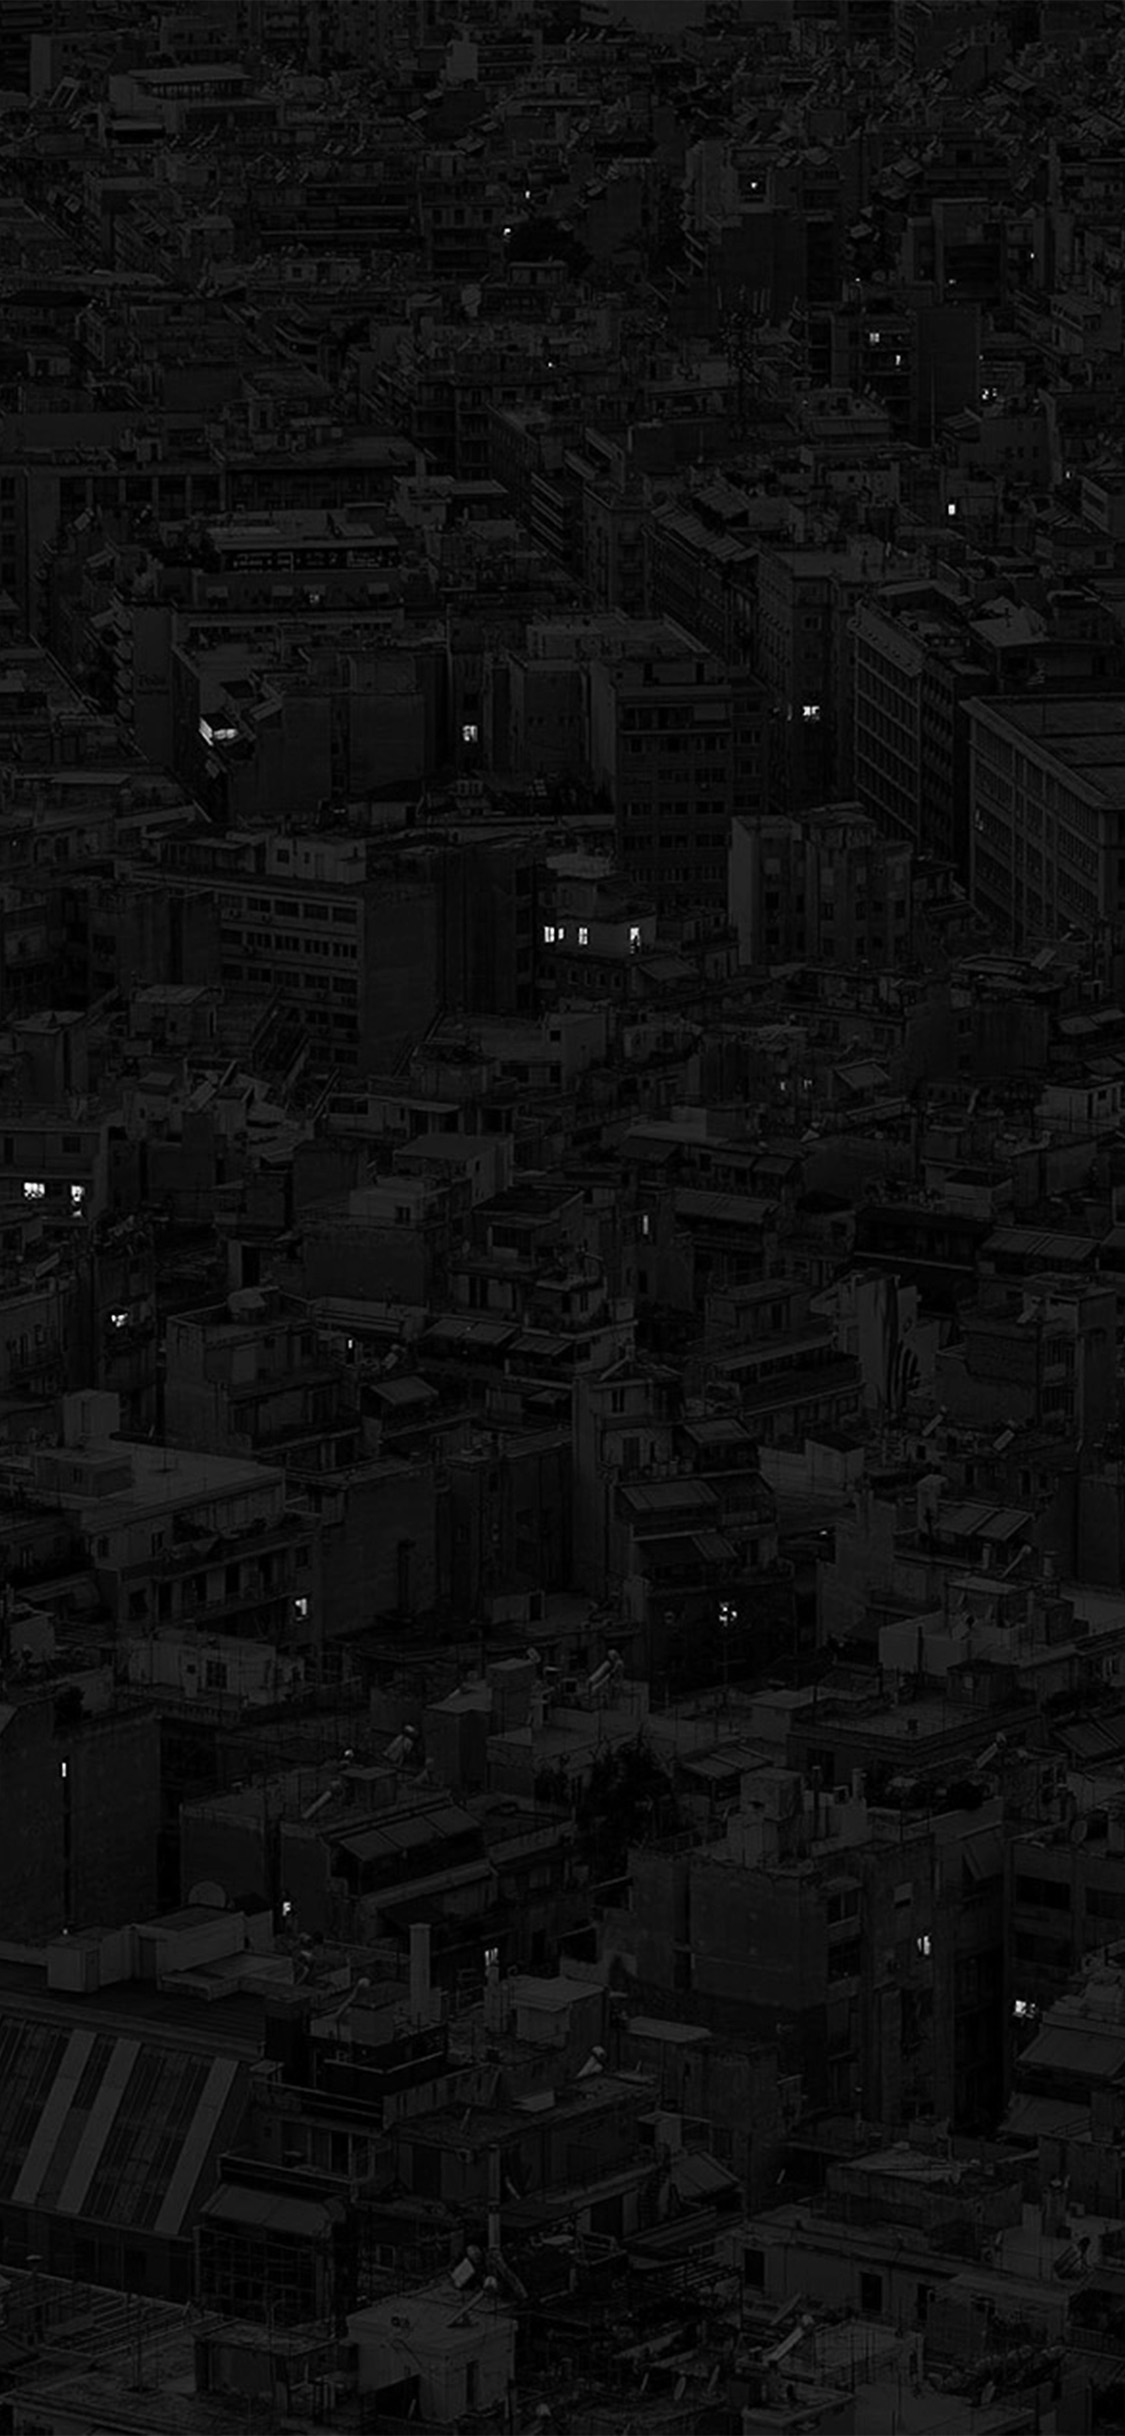 iPhonexpapers.com-Apple-iPhone-wallpaper-bd79-night-city-dark-art-illustration-bw